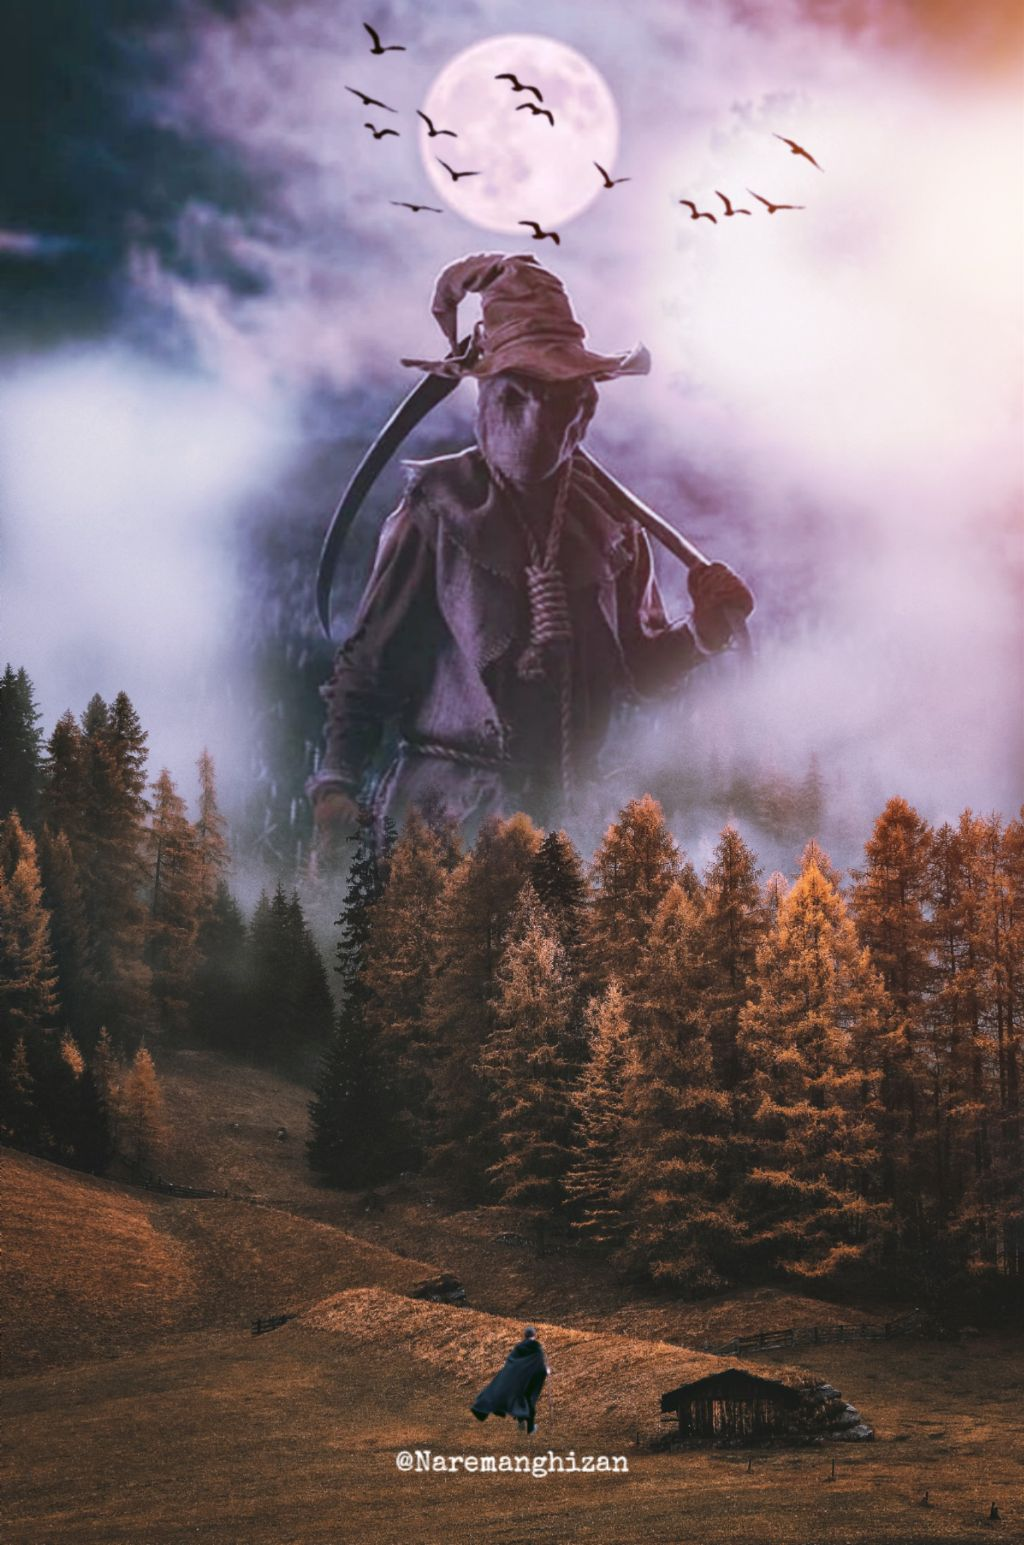 #freetoedit #halloween #picsArt #picture #sky #2019 @picsart